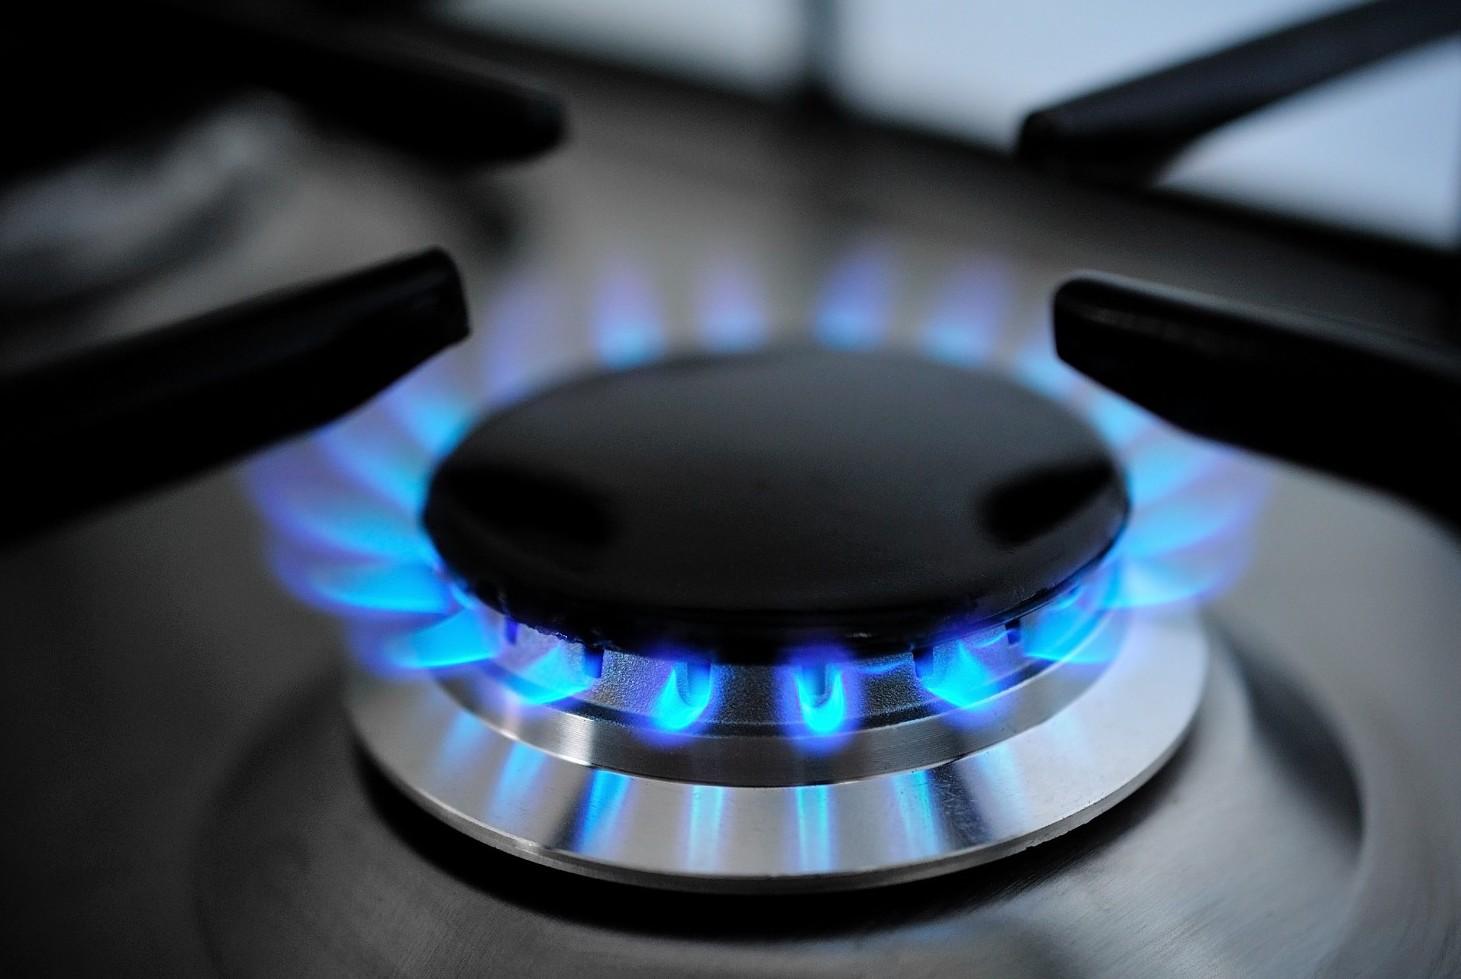 Voltura gas: quanto costa e come richiederla